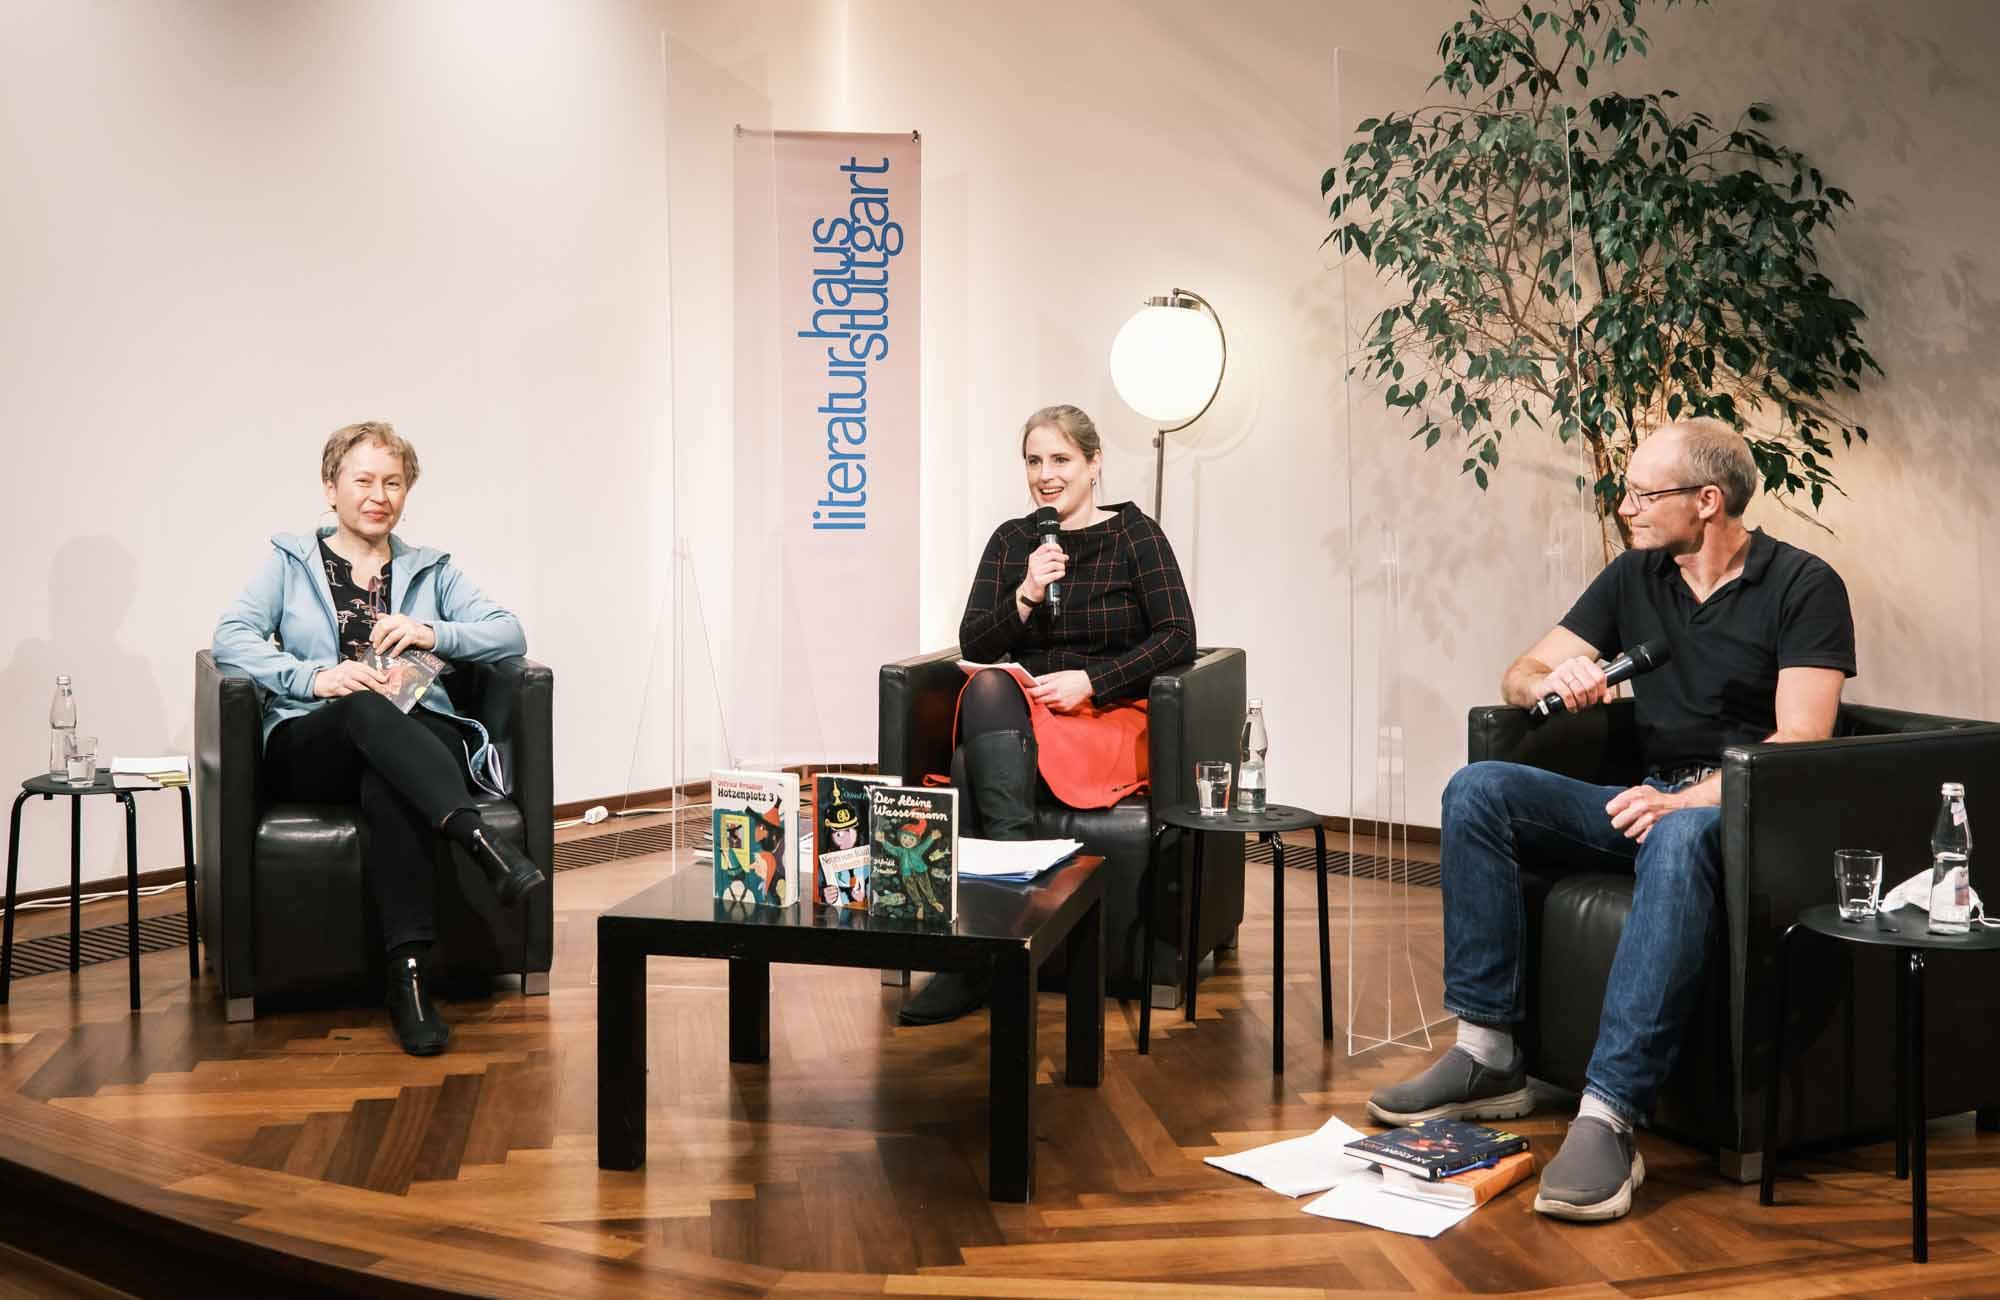 Ulrike Draesner, John von Düffel: Otfried Preußler <br/>(c) Sebastian Wenzel